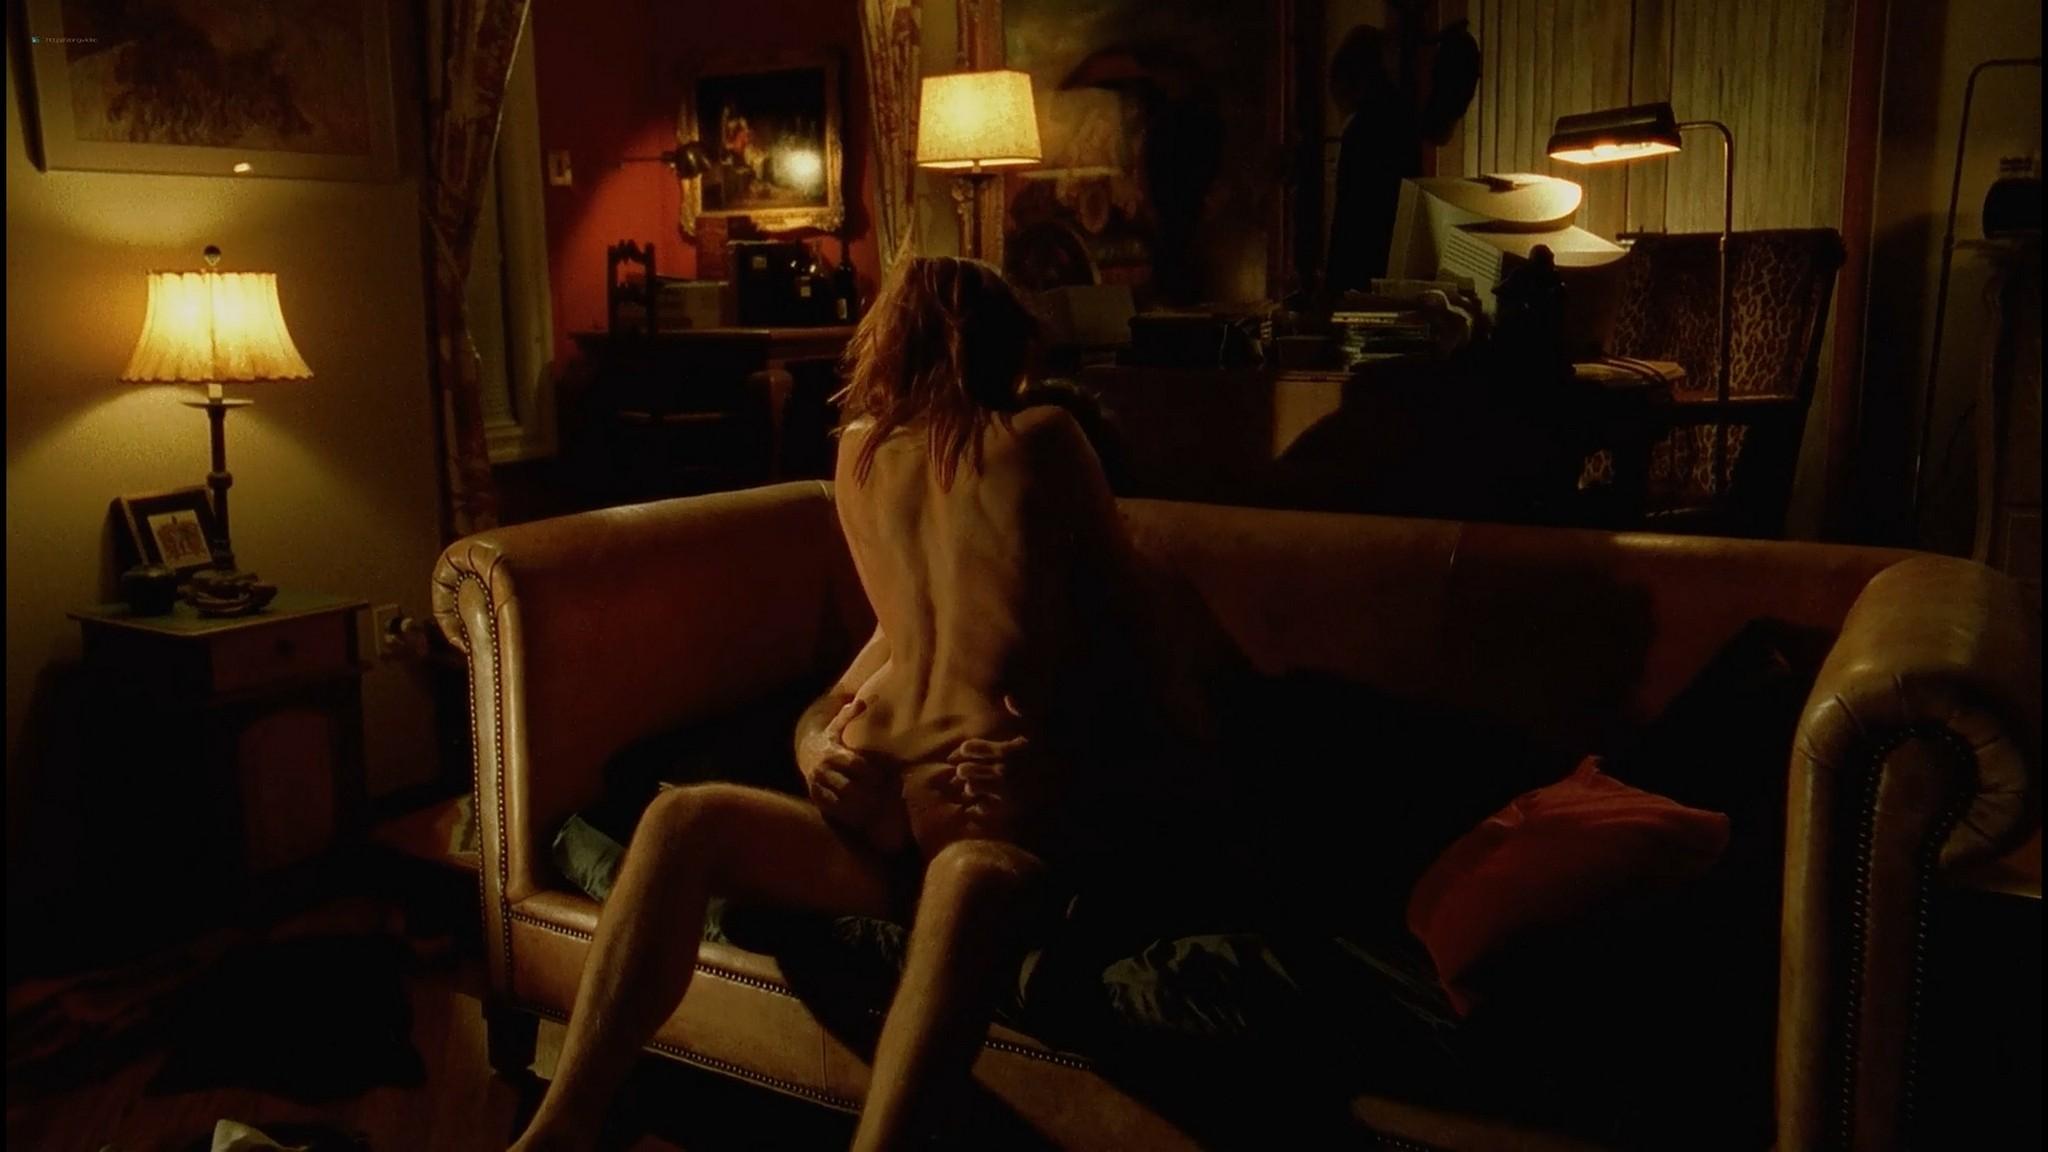 Serena Scott Thomas nude sex Sarah Lassez and others nude too Brothel 2008 1080p Web 4